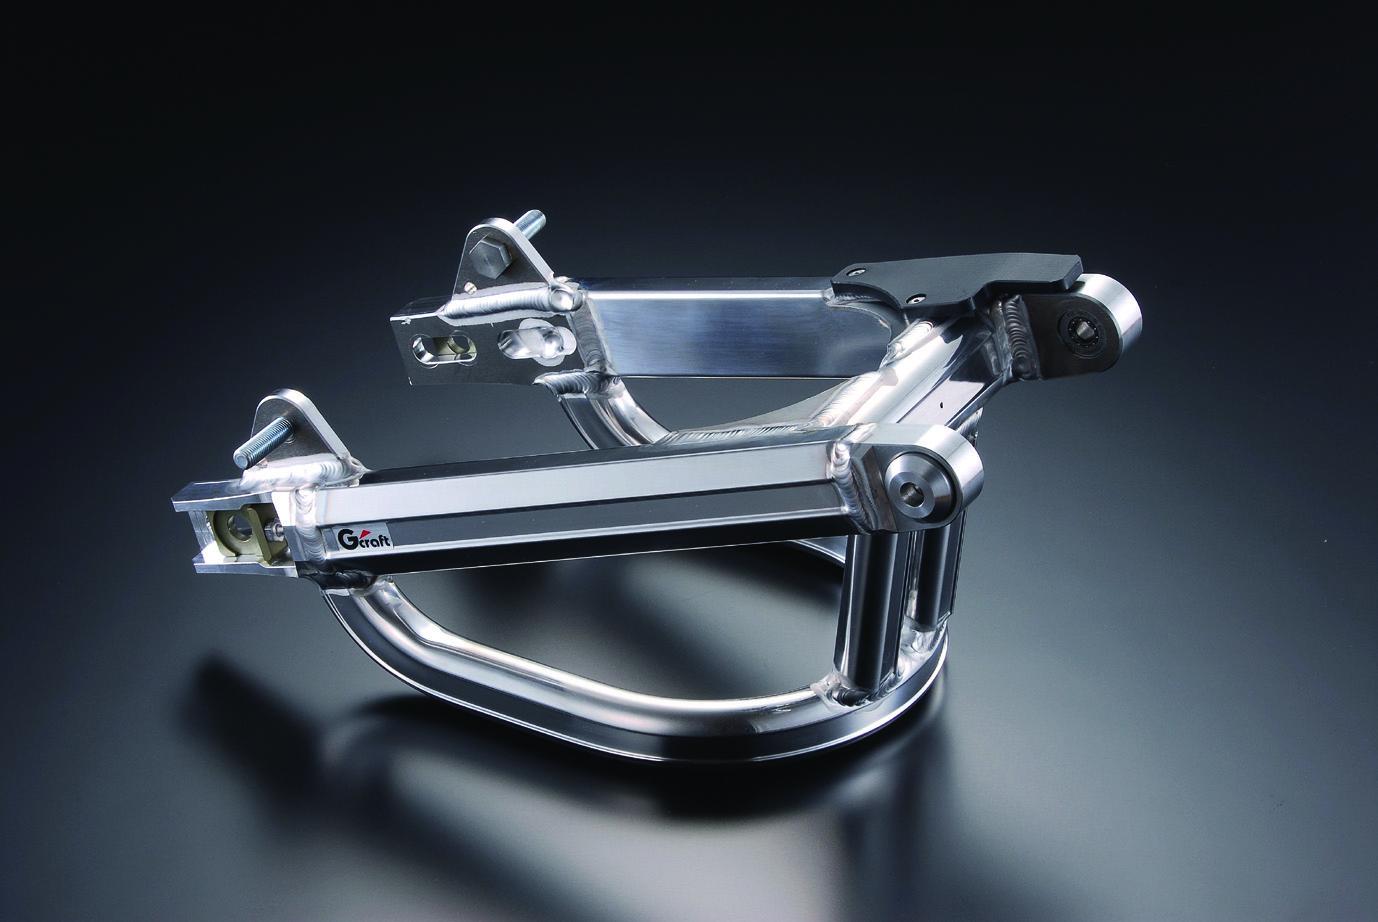 【G-Craft】標準型雙避震後搖臂  Triple Square結構 附平衡架 16cm長 - 「Webike-摩托百貨」